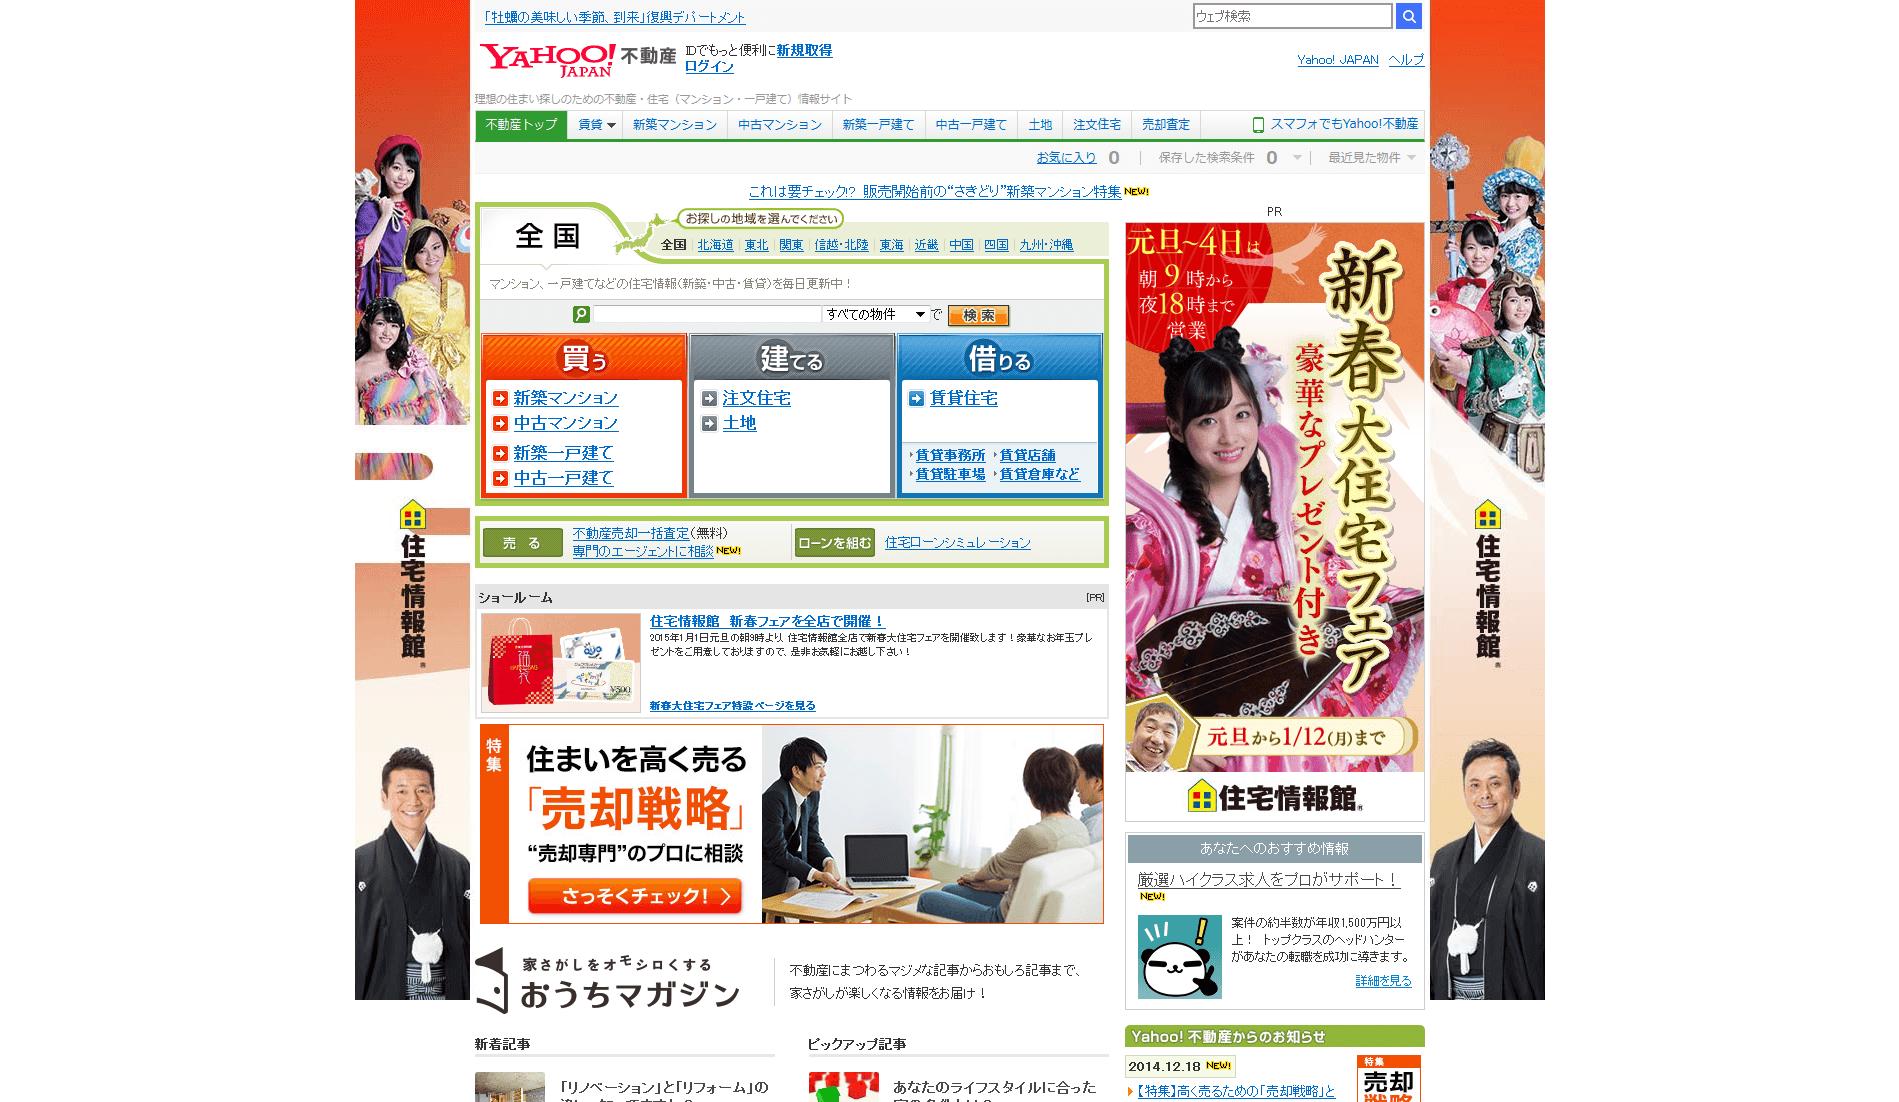 Yahoo!不動産 - 不動産・住宅(マンション・一戸建て)情報サイト